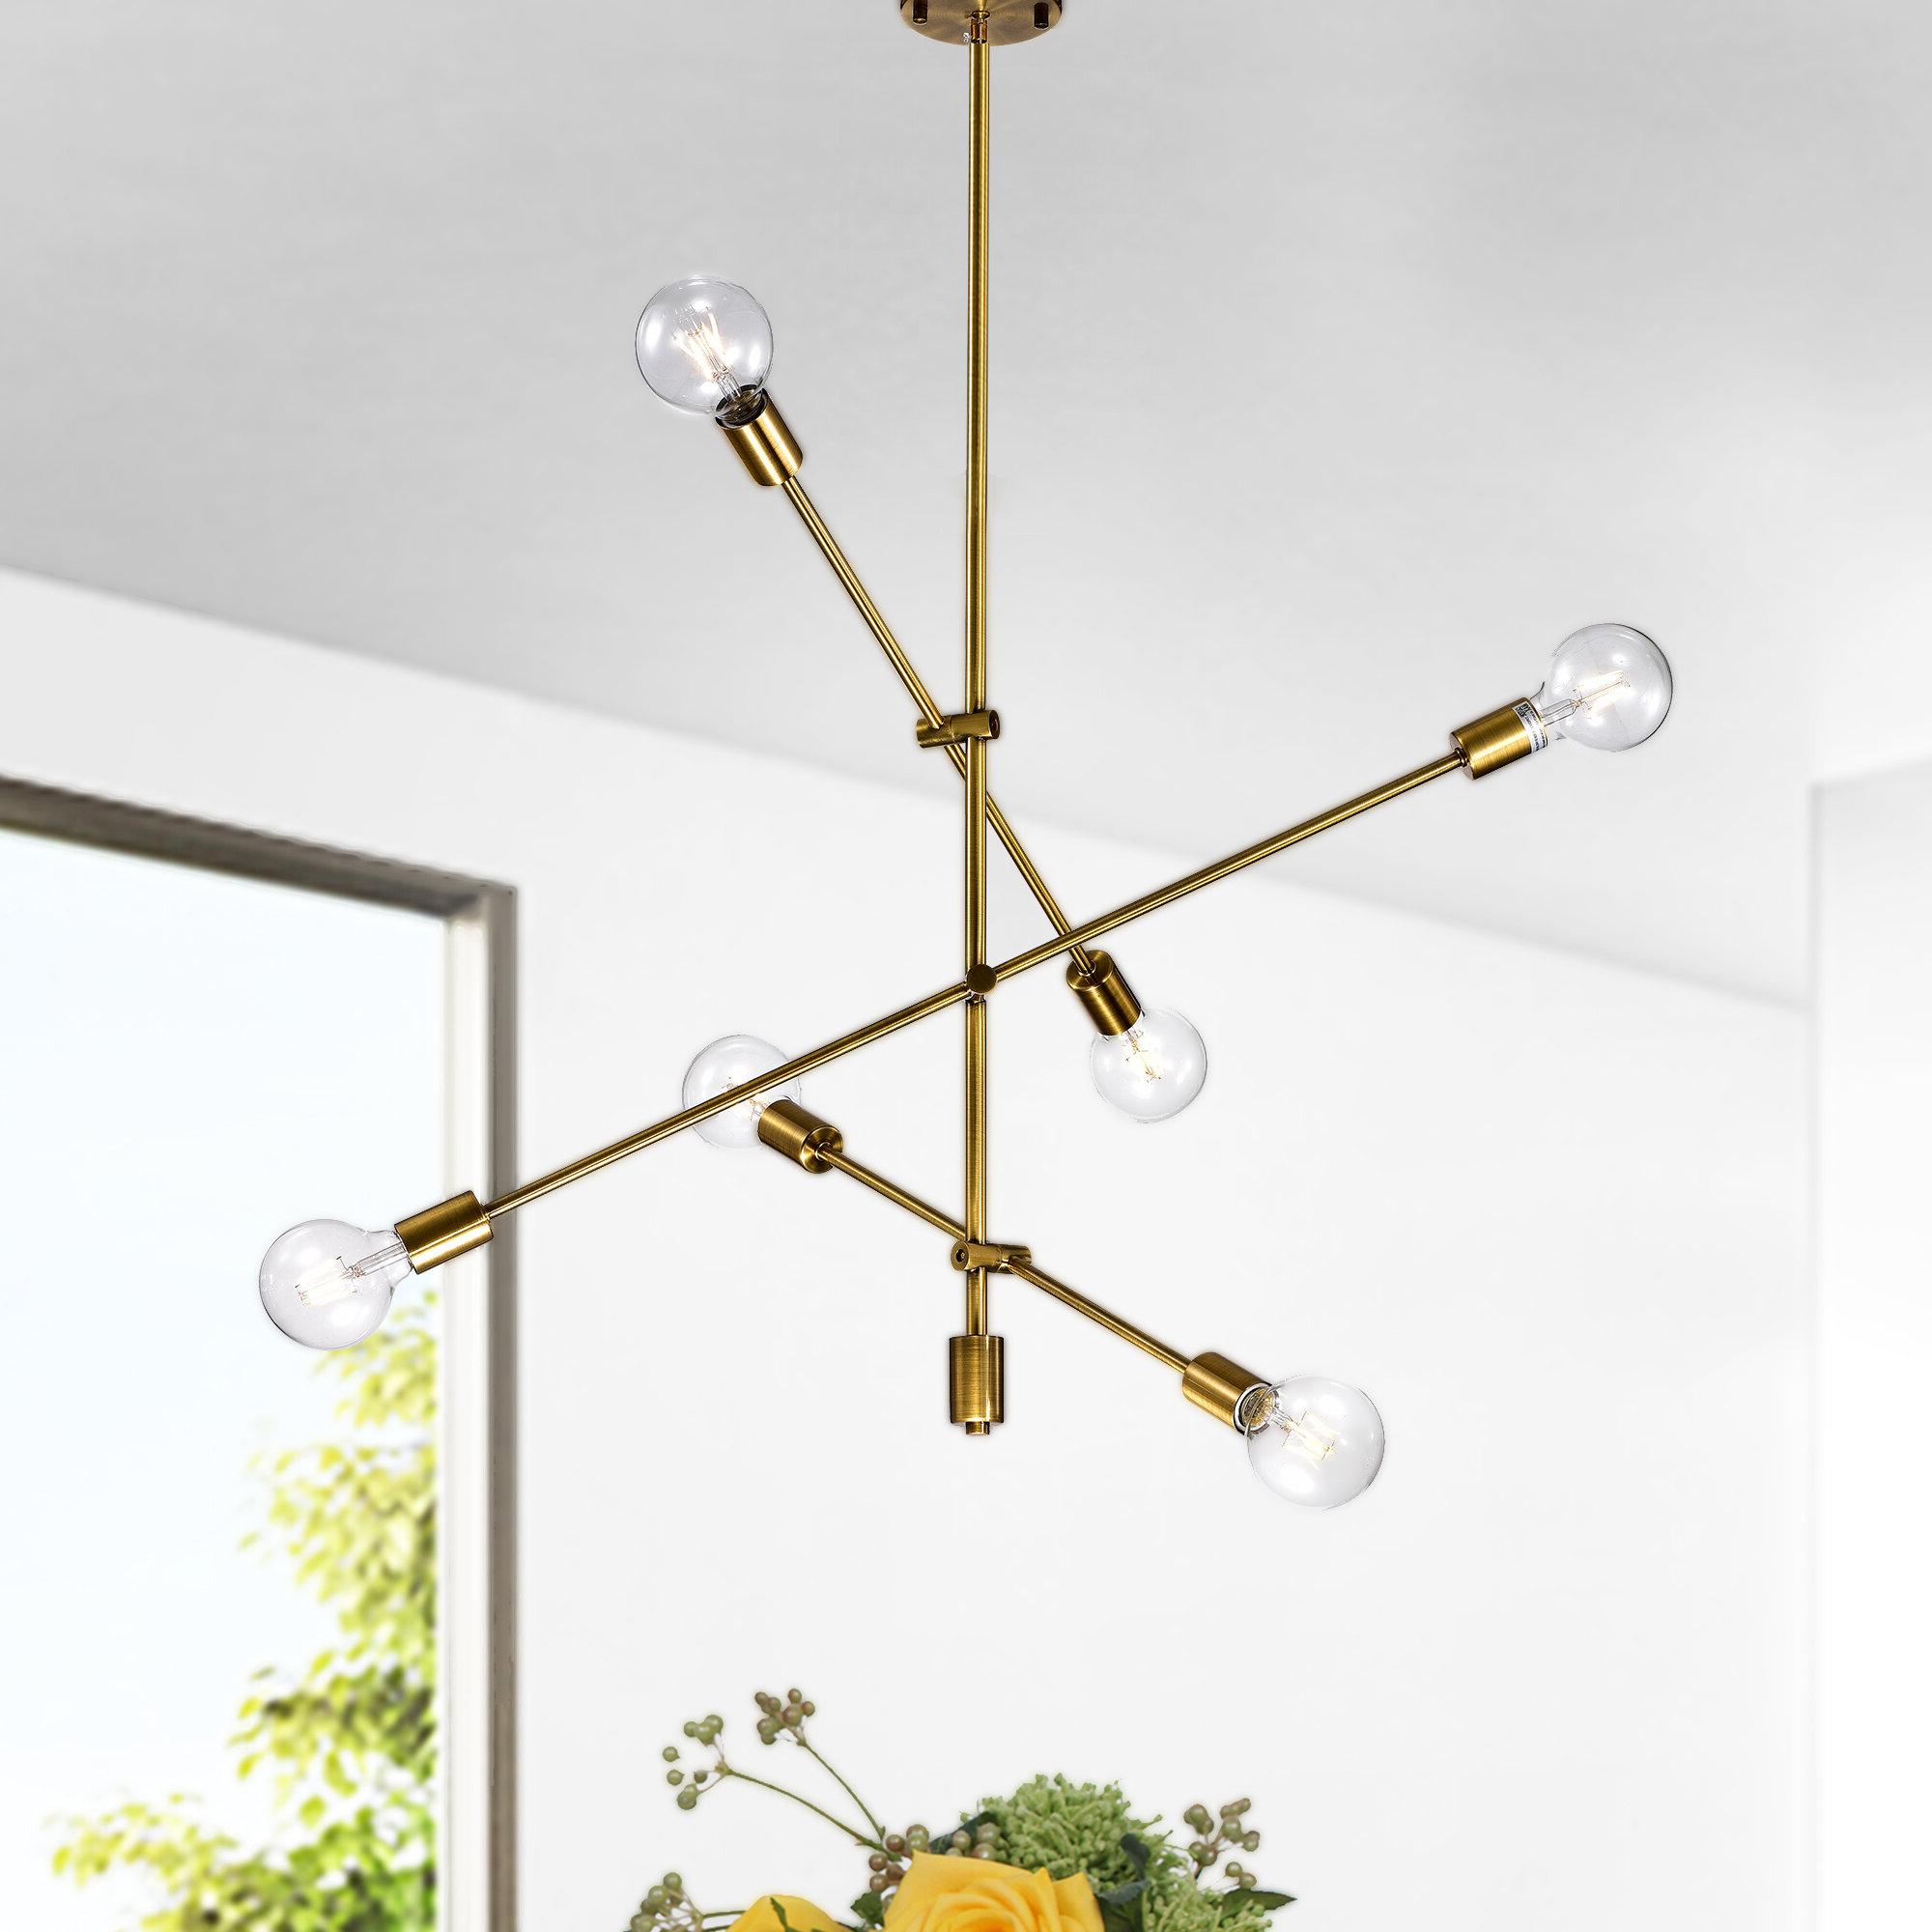 Naughton 6 Light Sputnik Chandelier Inside Best And Newest Johanne 6 Light Sputnik Chandeliers (View 17 of 20)